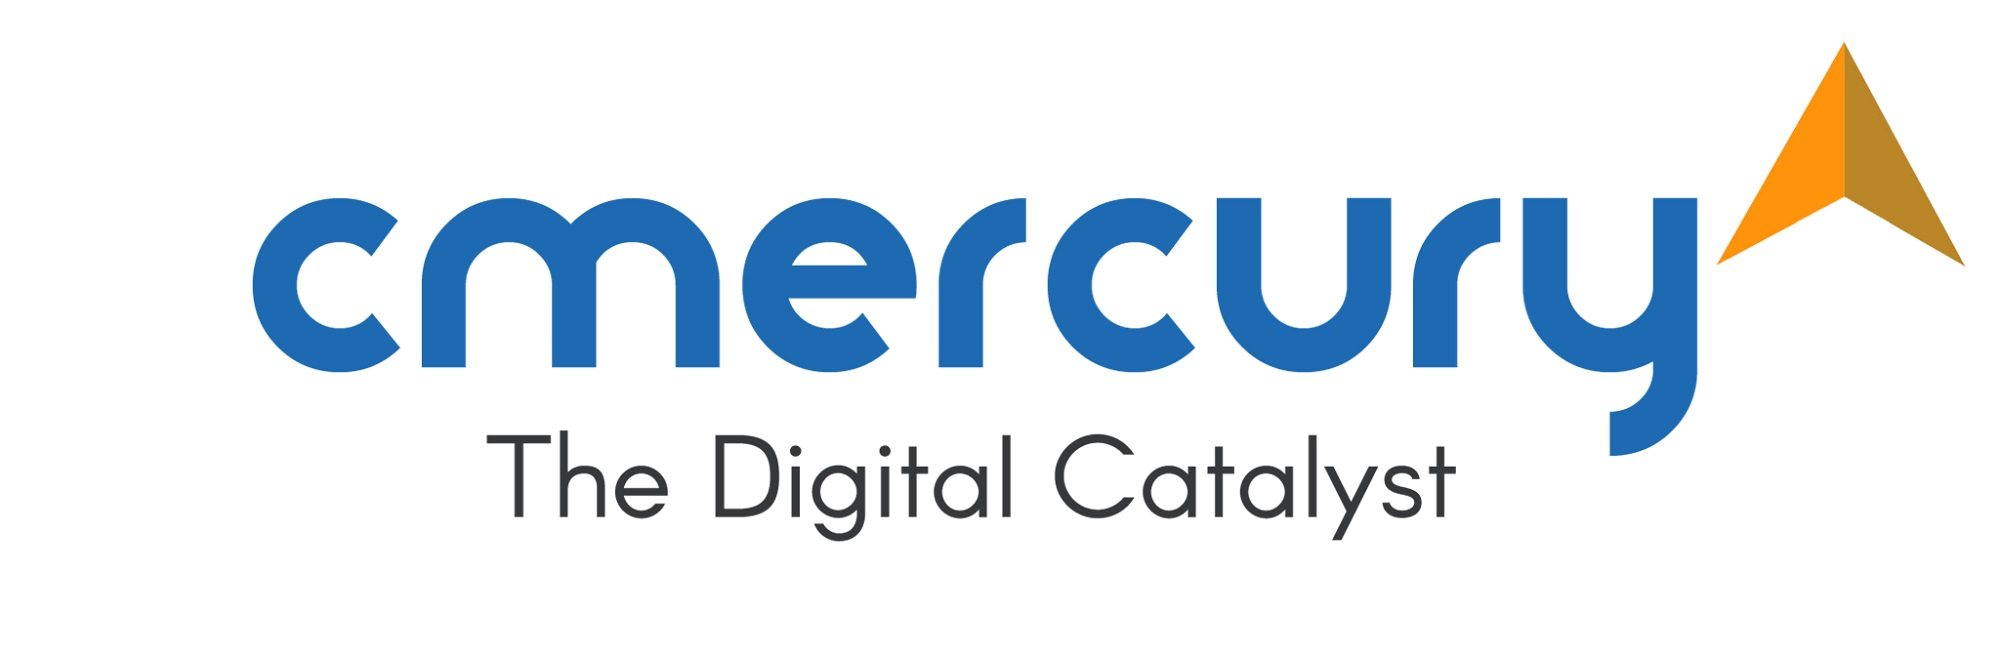 Marketing automation player cmercury bags SMS mandate for Wonderchef